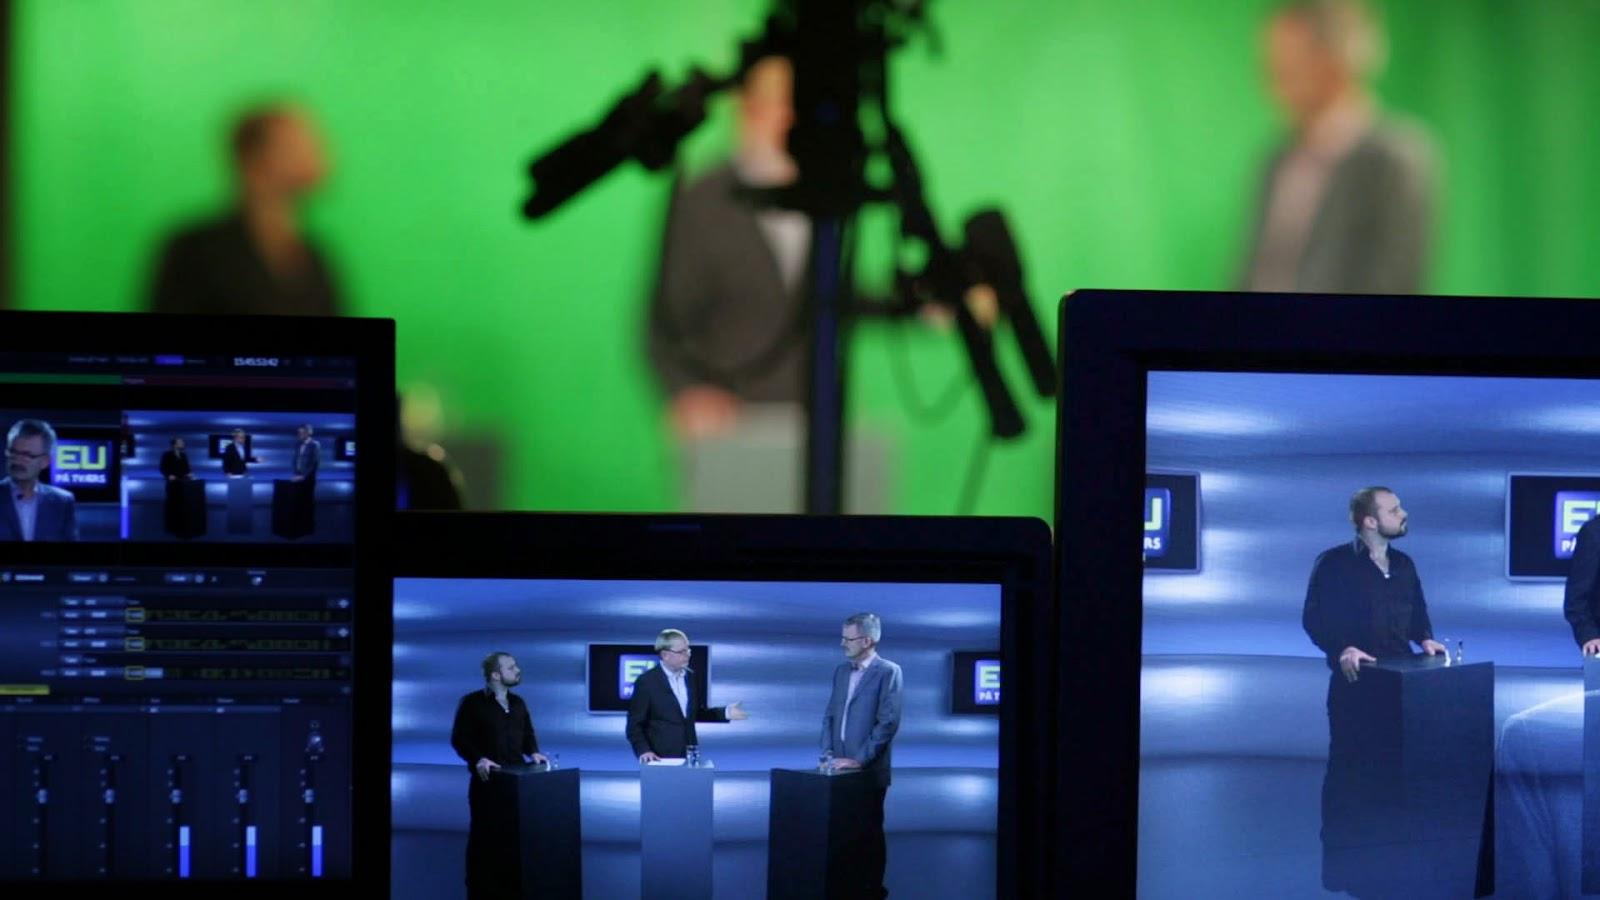 Media  Streaming Videos on SchoolhouseTeacherscom